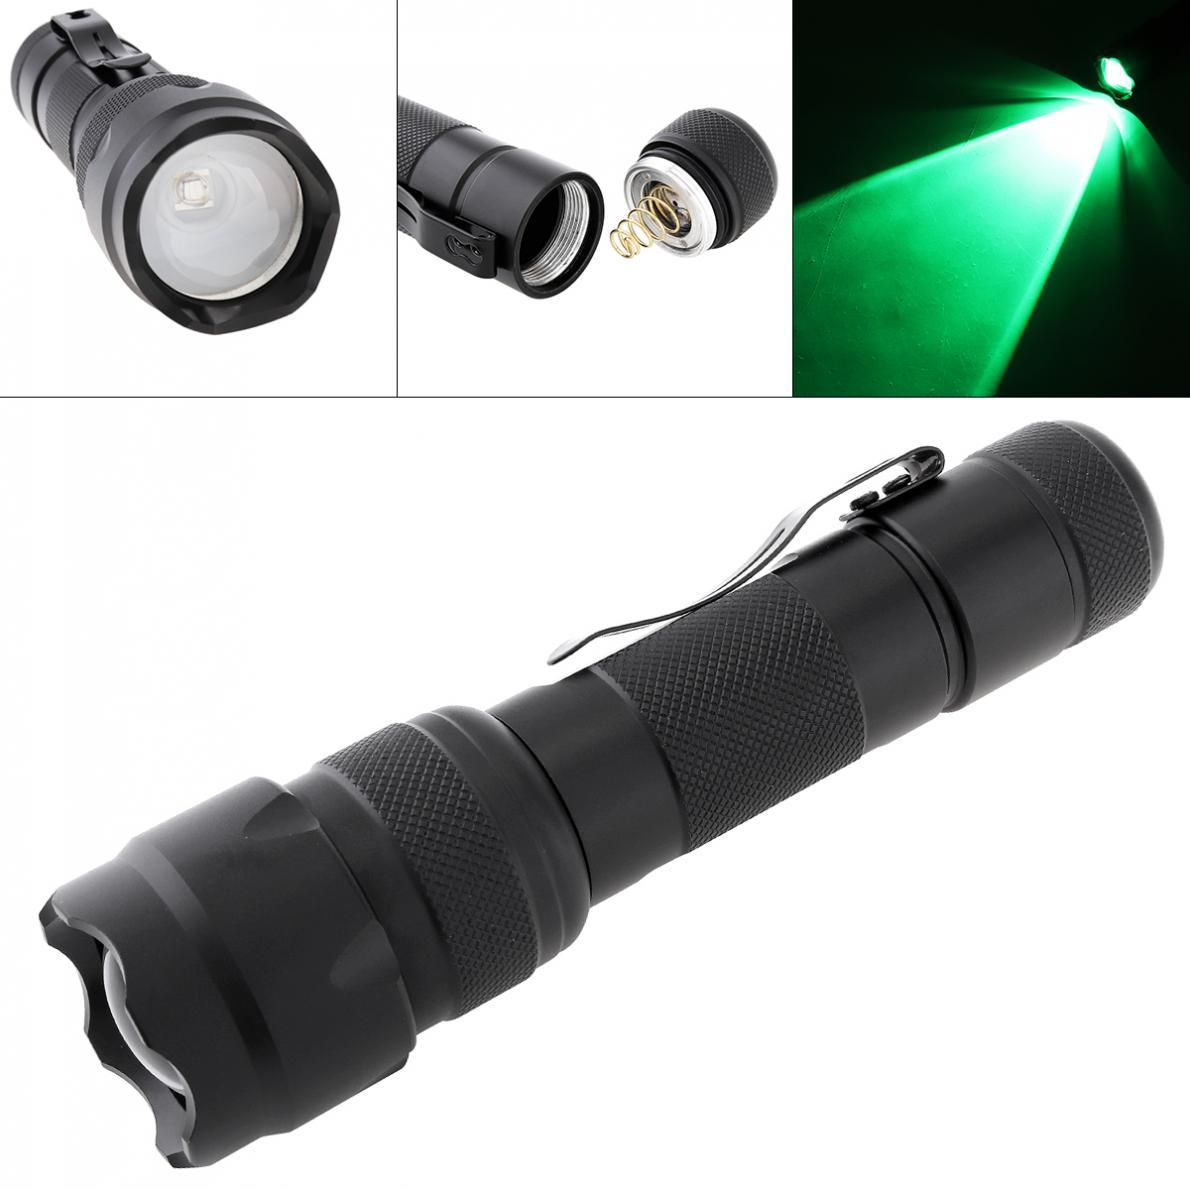 Linterna LED Zoom Tourch 502B 18650 Mini luz verde XML T6 LED 1200 lúmenes a prueba de agua para pesca caza Camping ciclismo